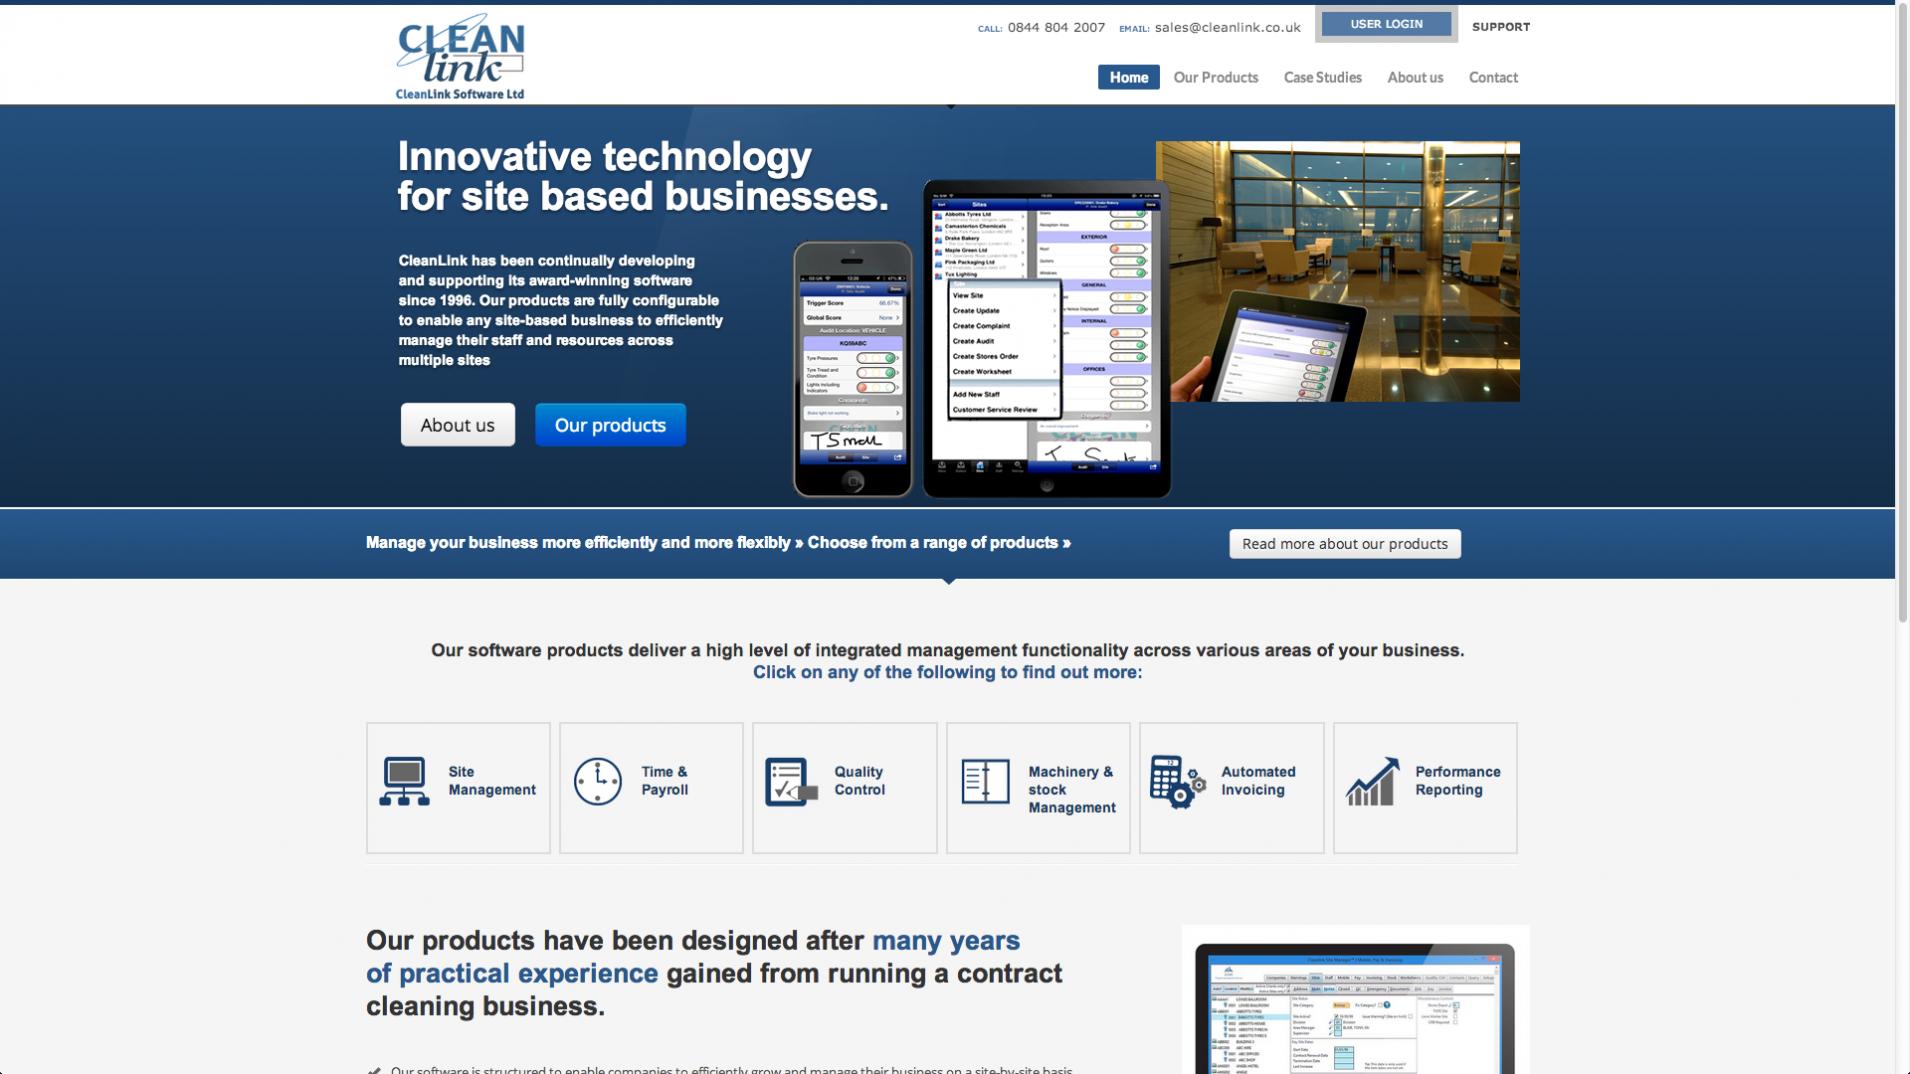 Screen Shot 2013 12 23 at 16.27.22 - Webdesign for software development company